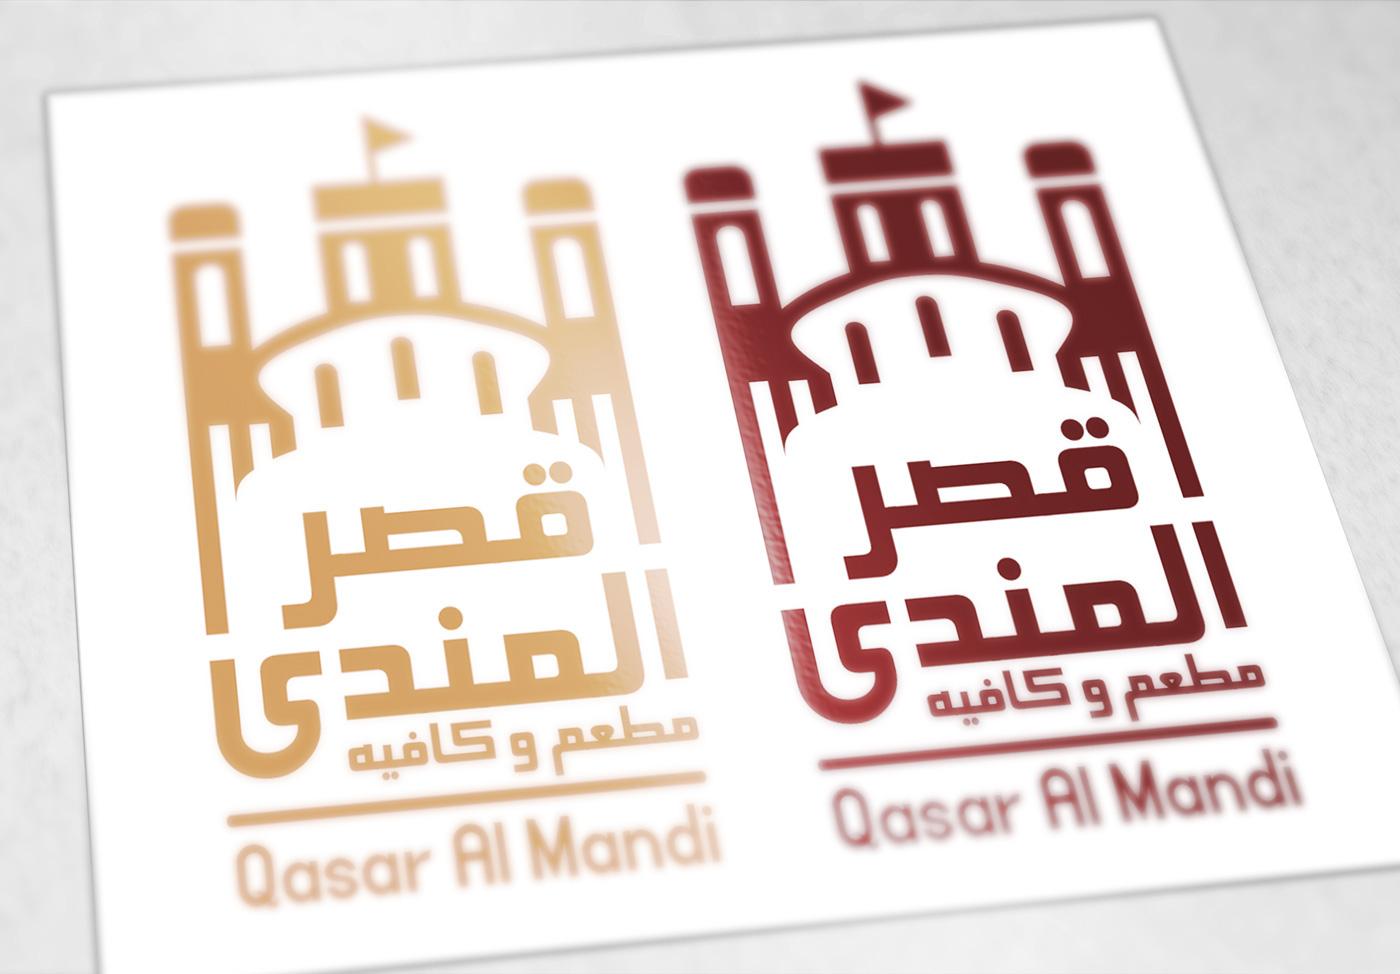 graphic design logo brand branding  qasar al mandi Food  dubai